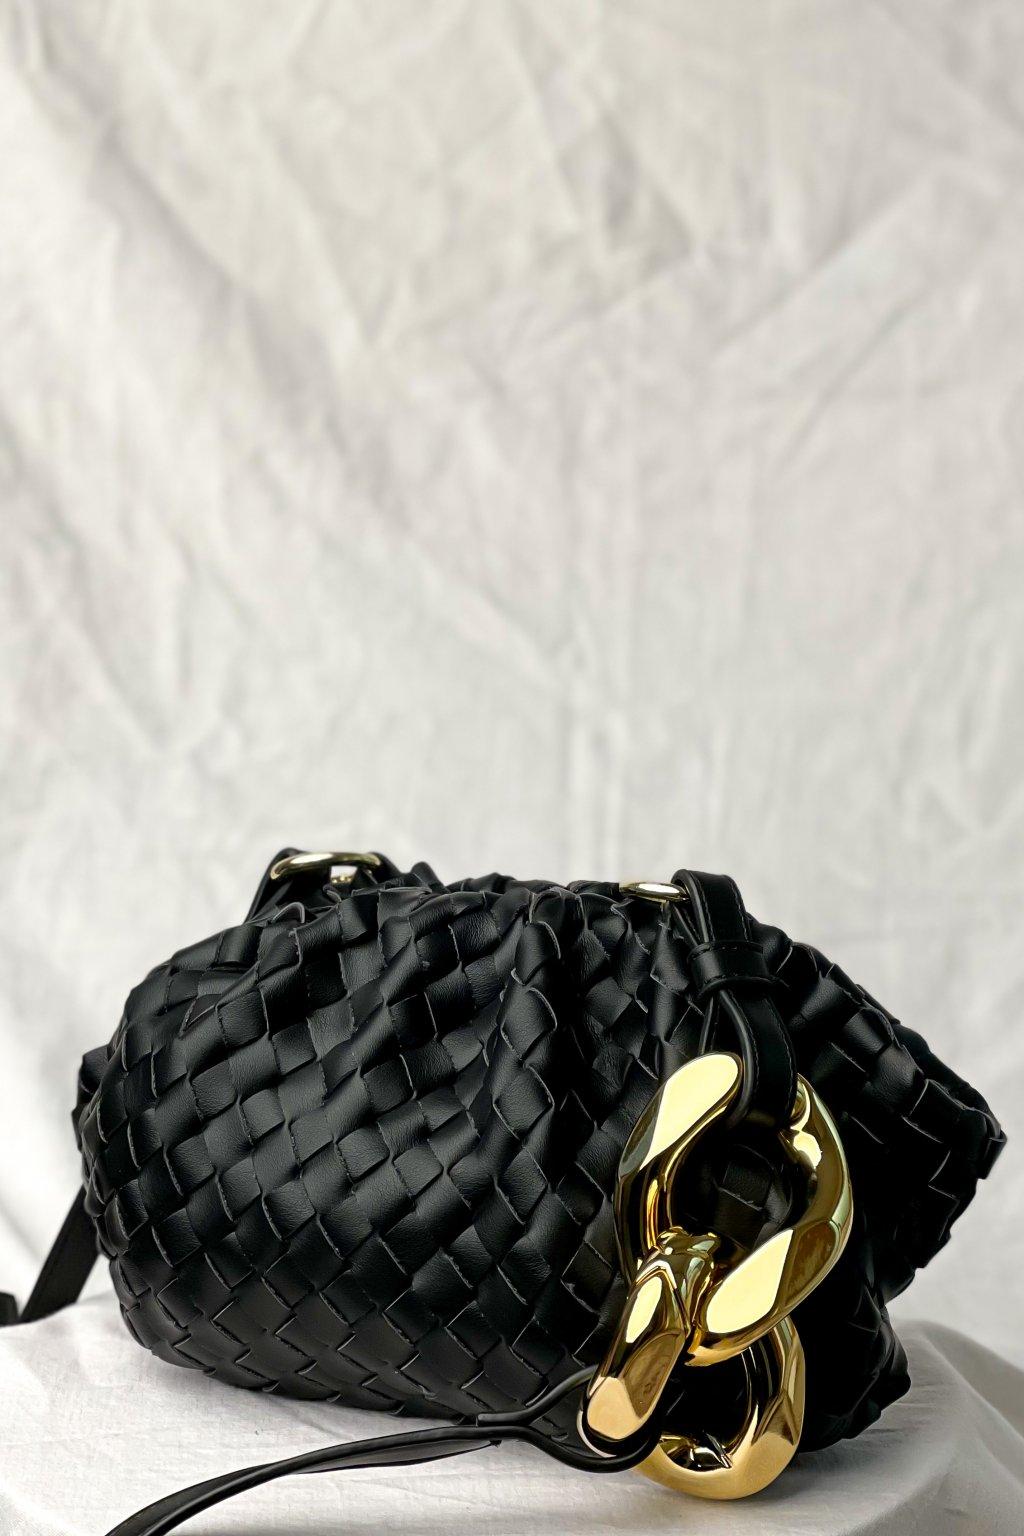 Čierna crossbody kabelka s riasením